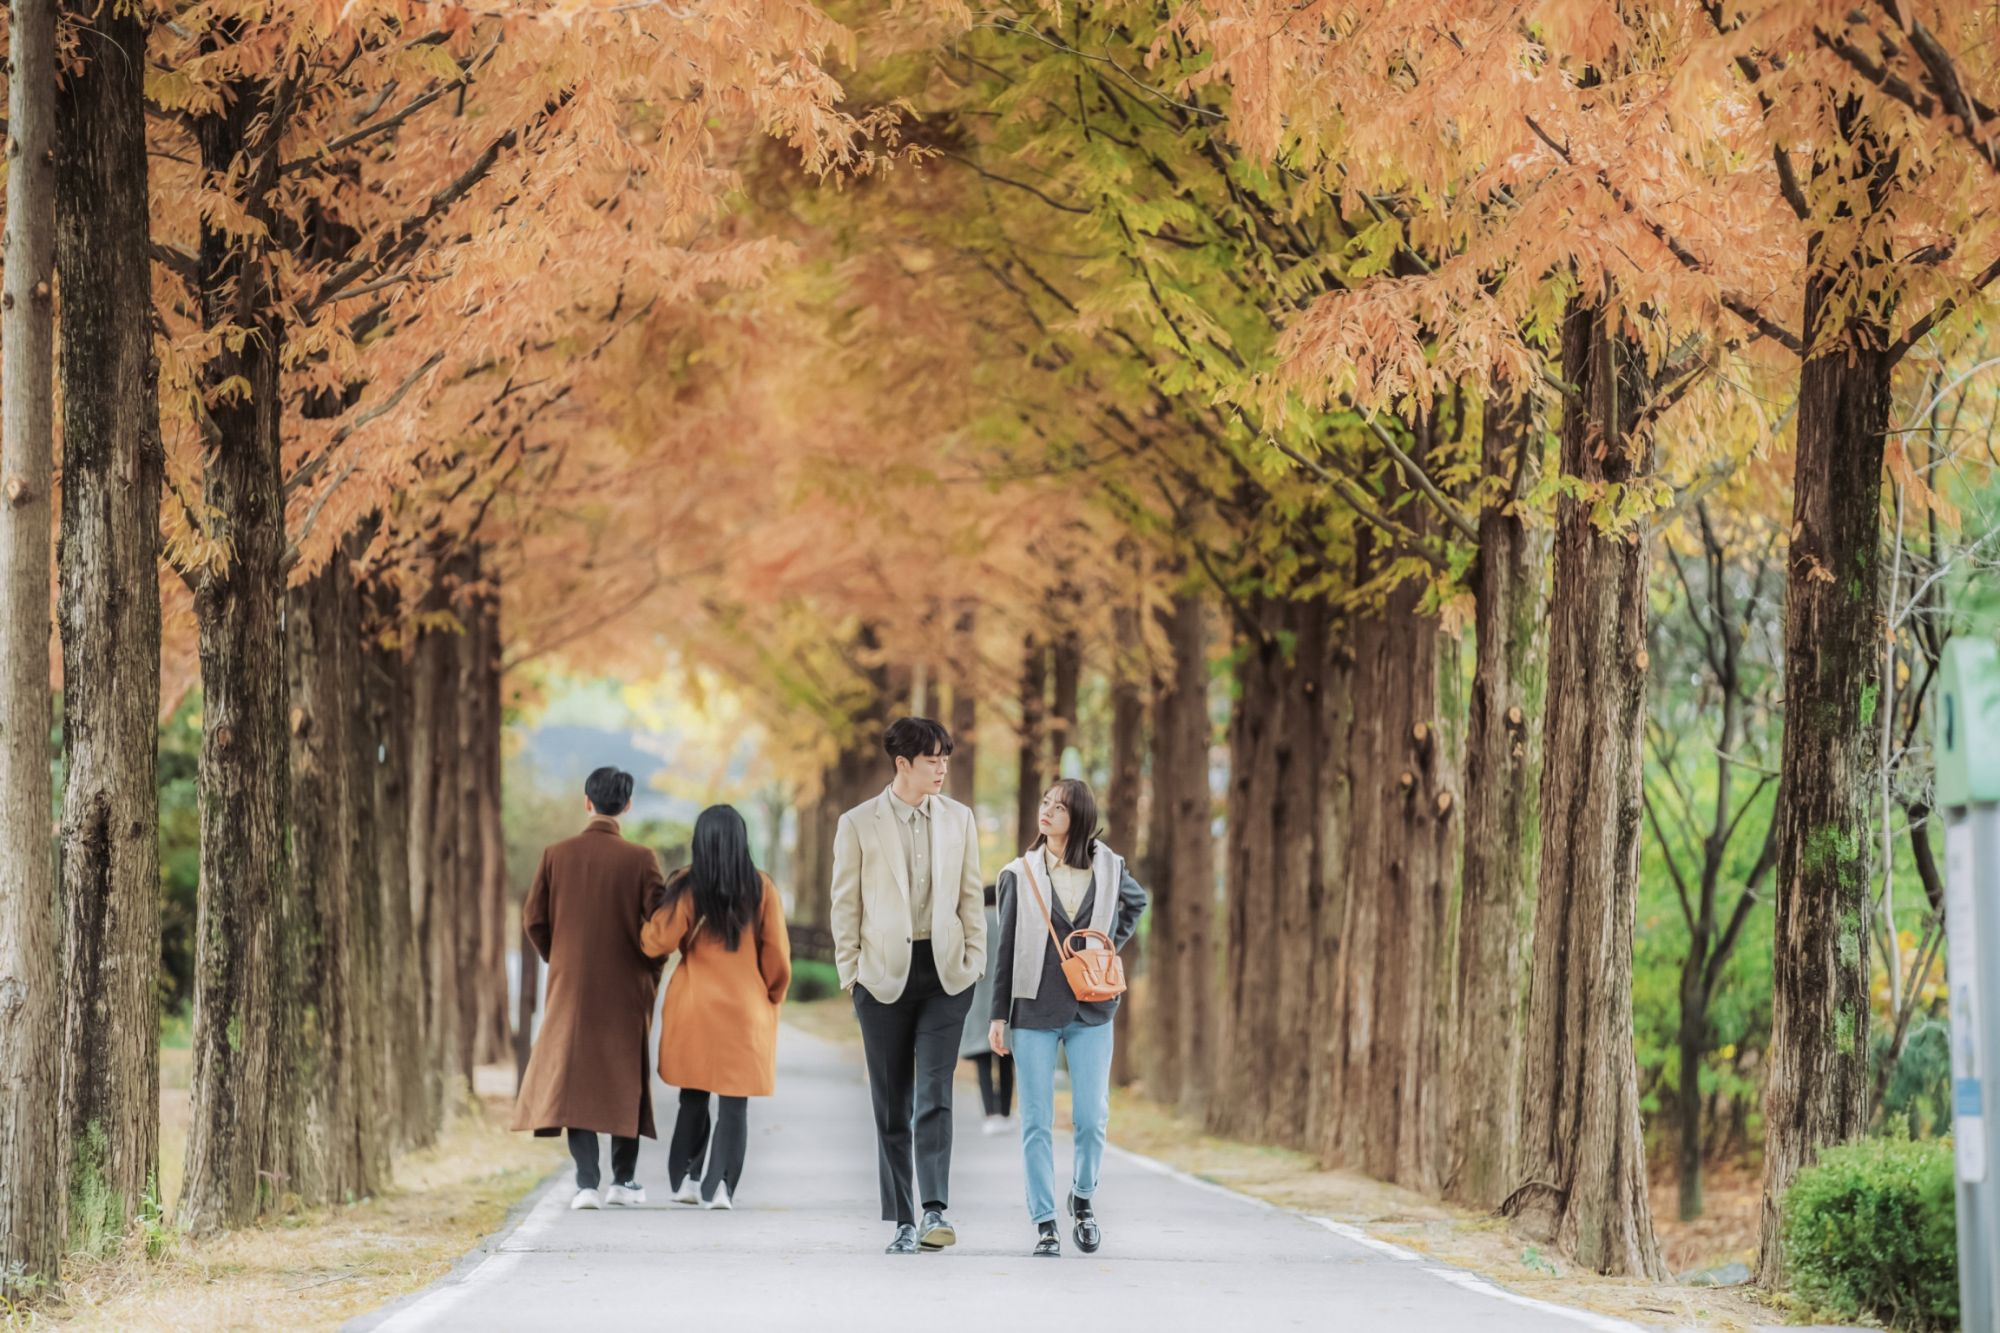 30 Best New Korean Dramas To Binge-Watch In 2021